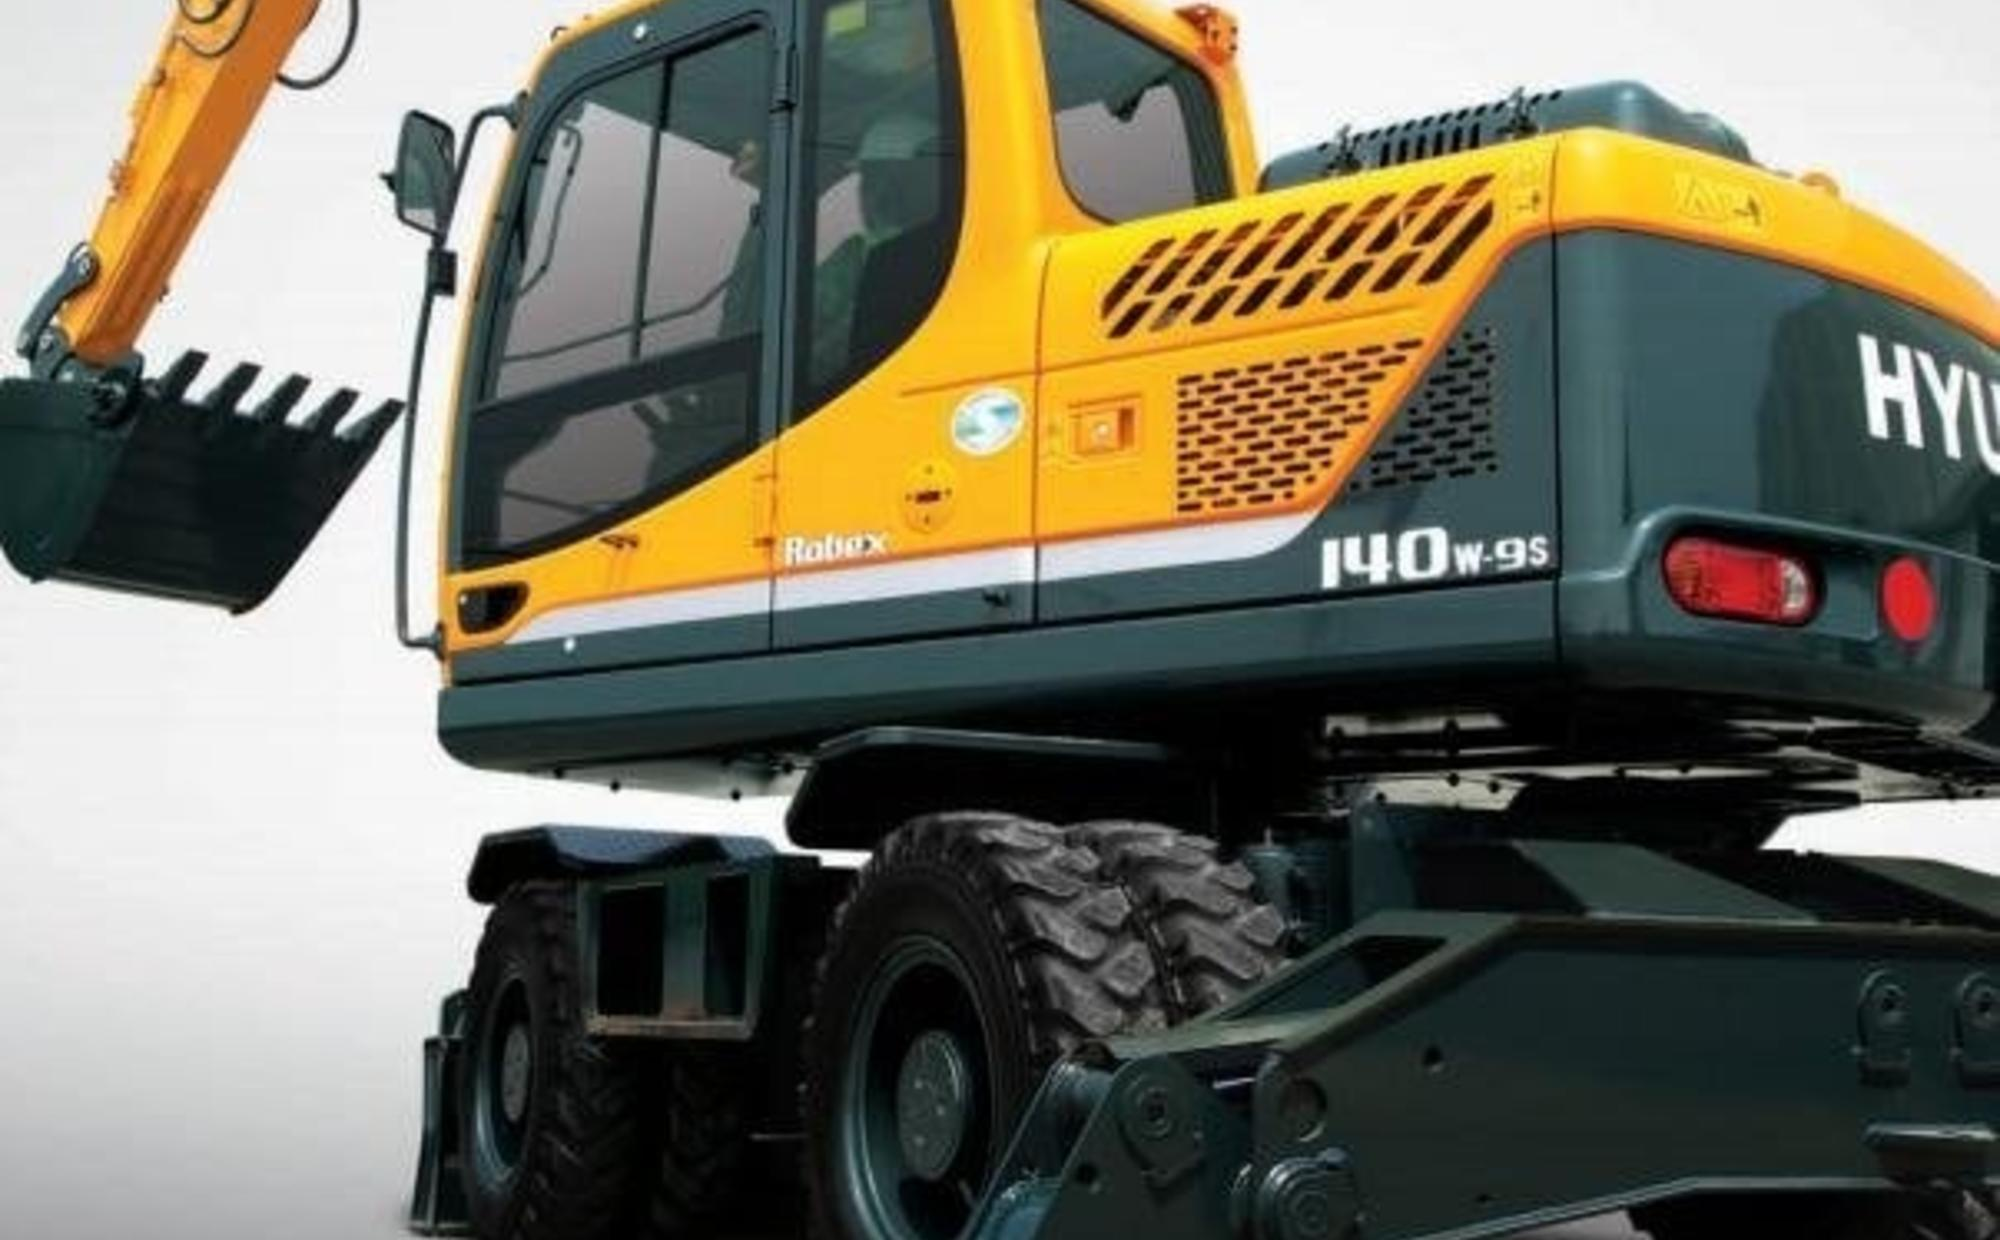 Аренда Hyundai R140W-9S